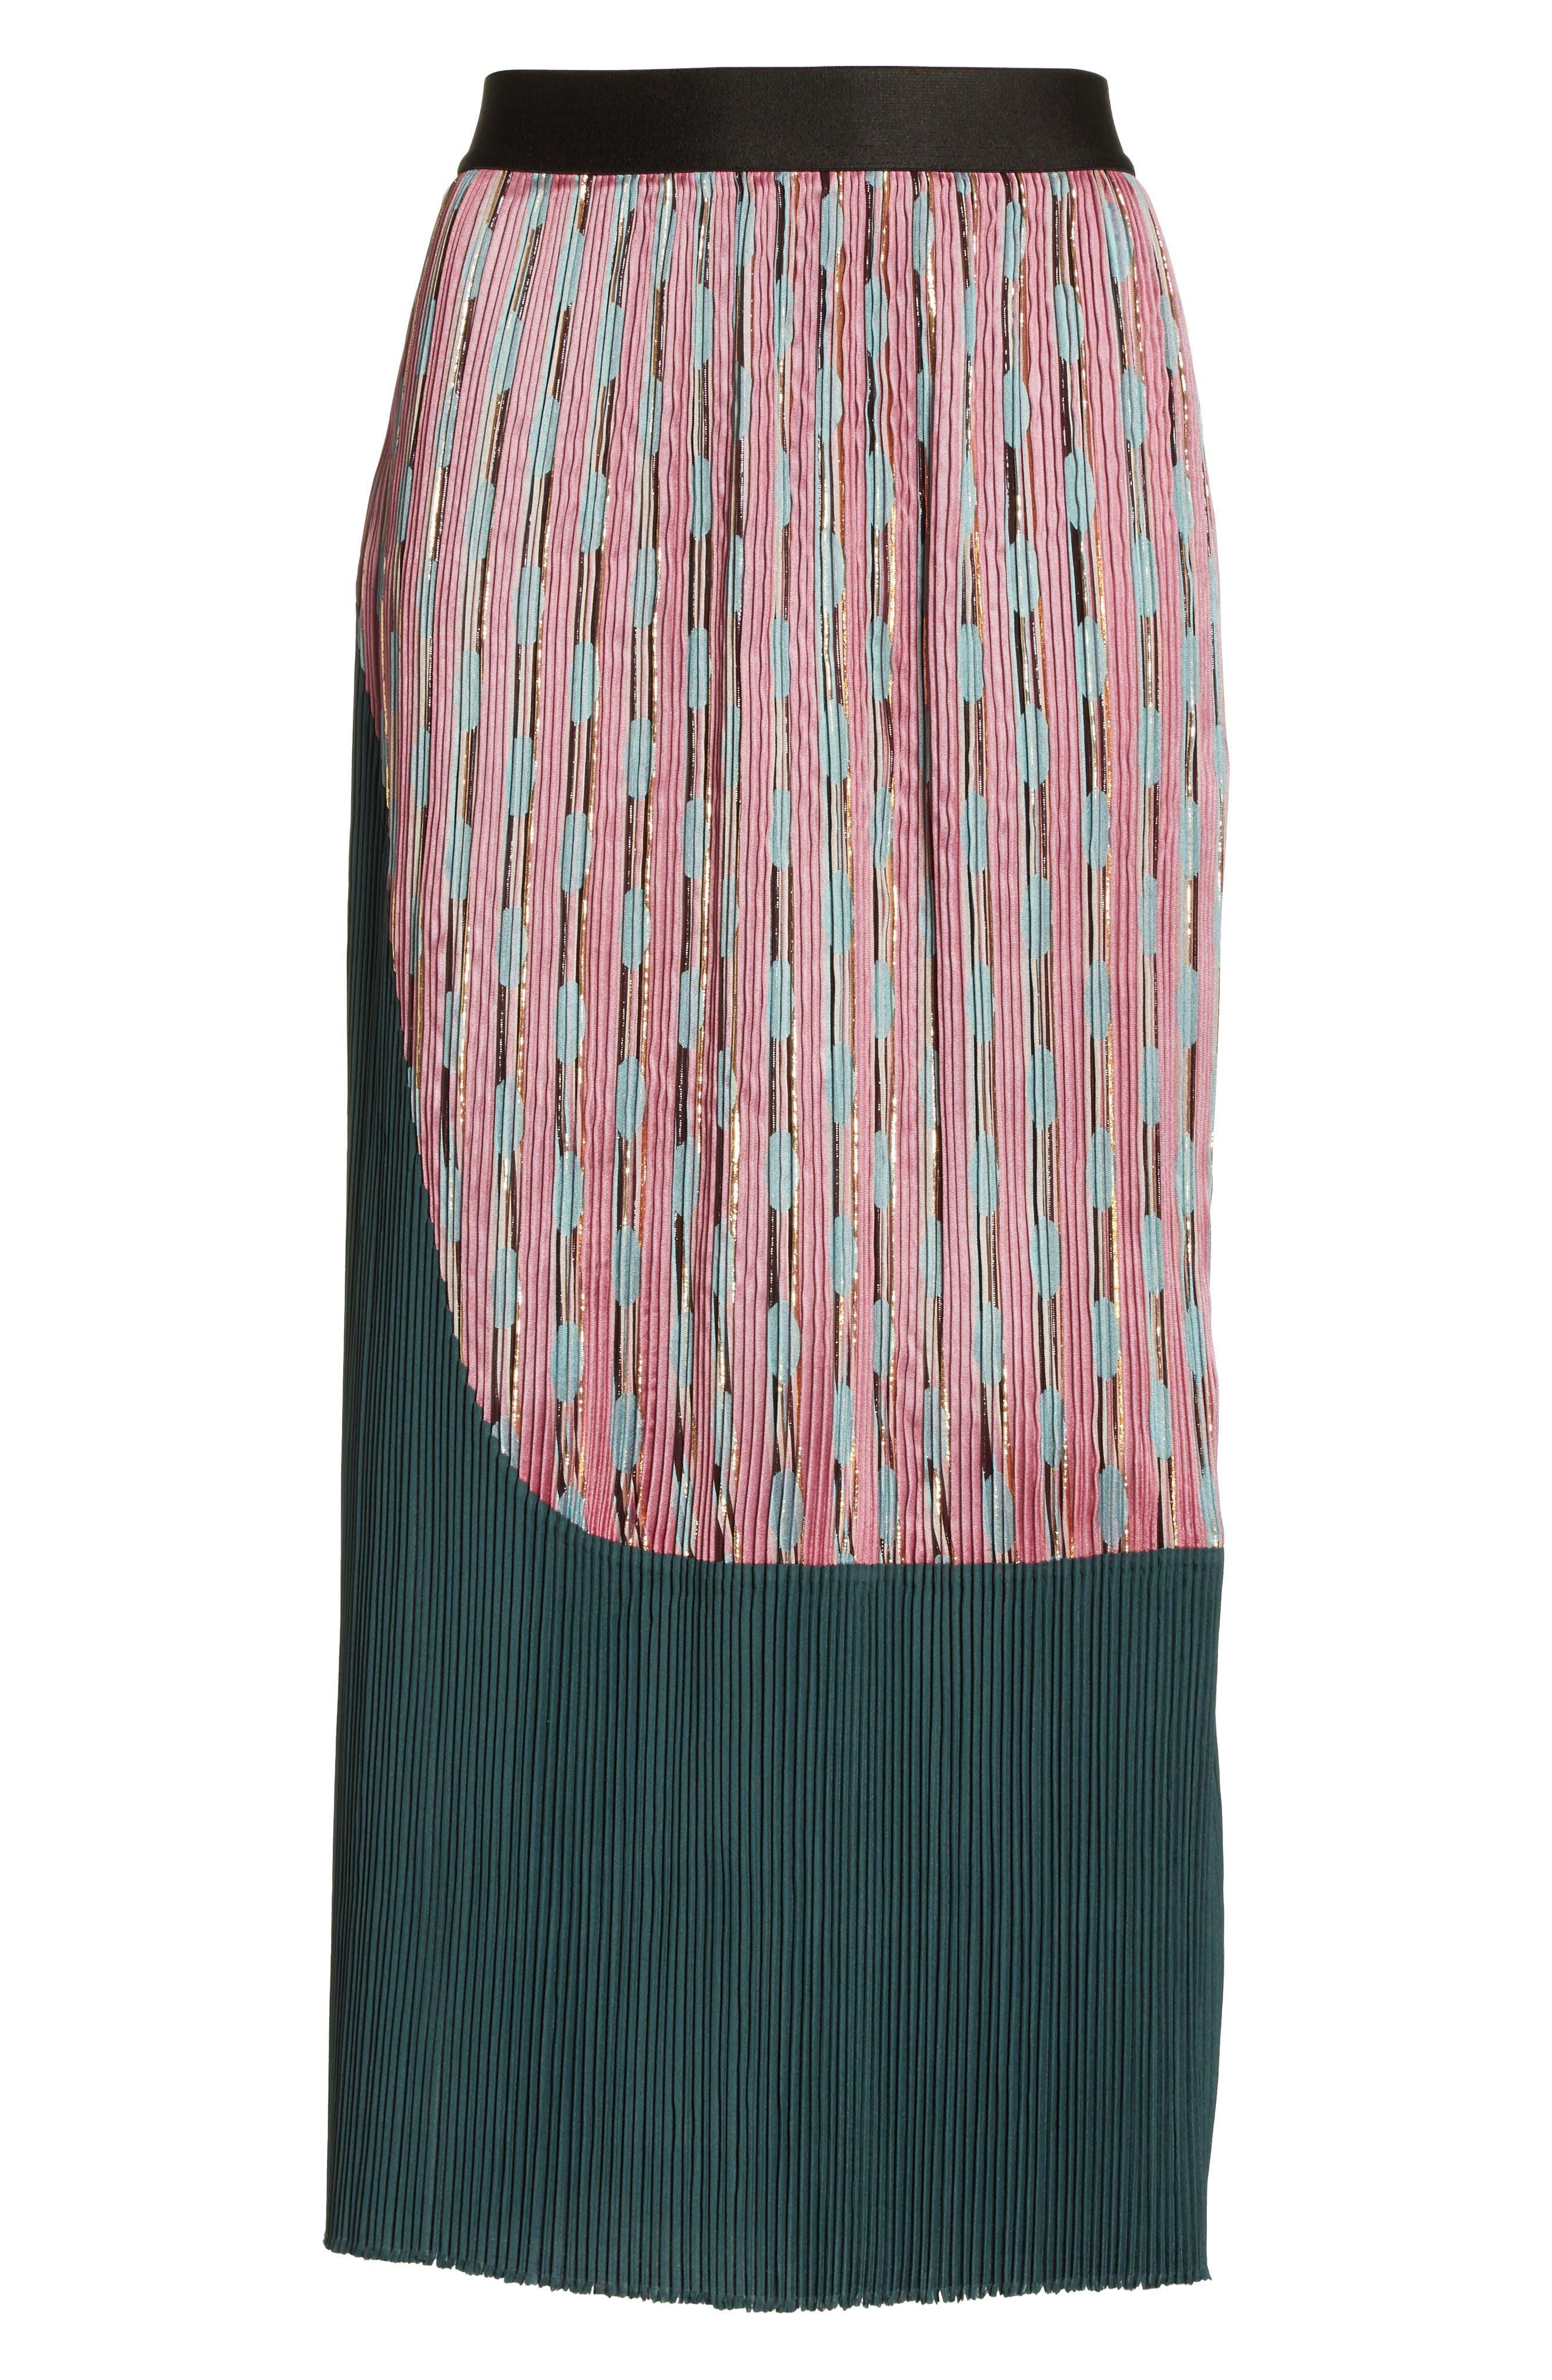 Ballista Midi Skirt,                             Alternate thumbnail 11, color,